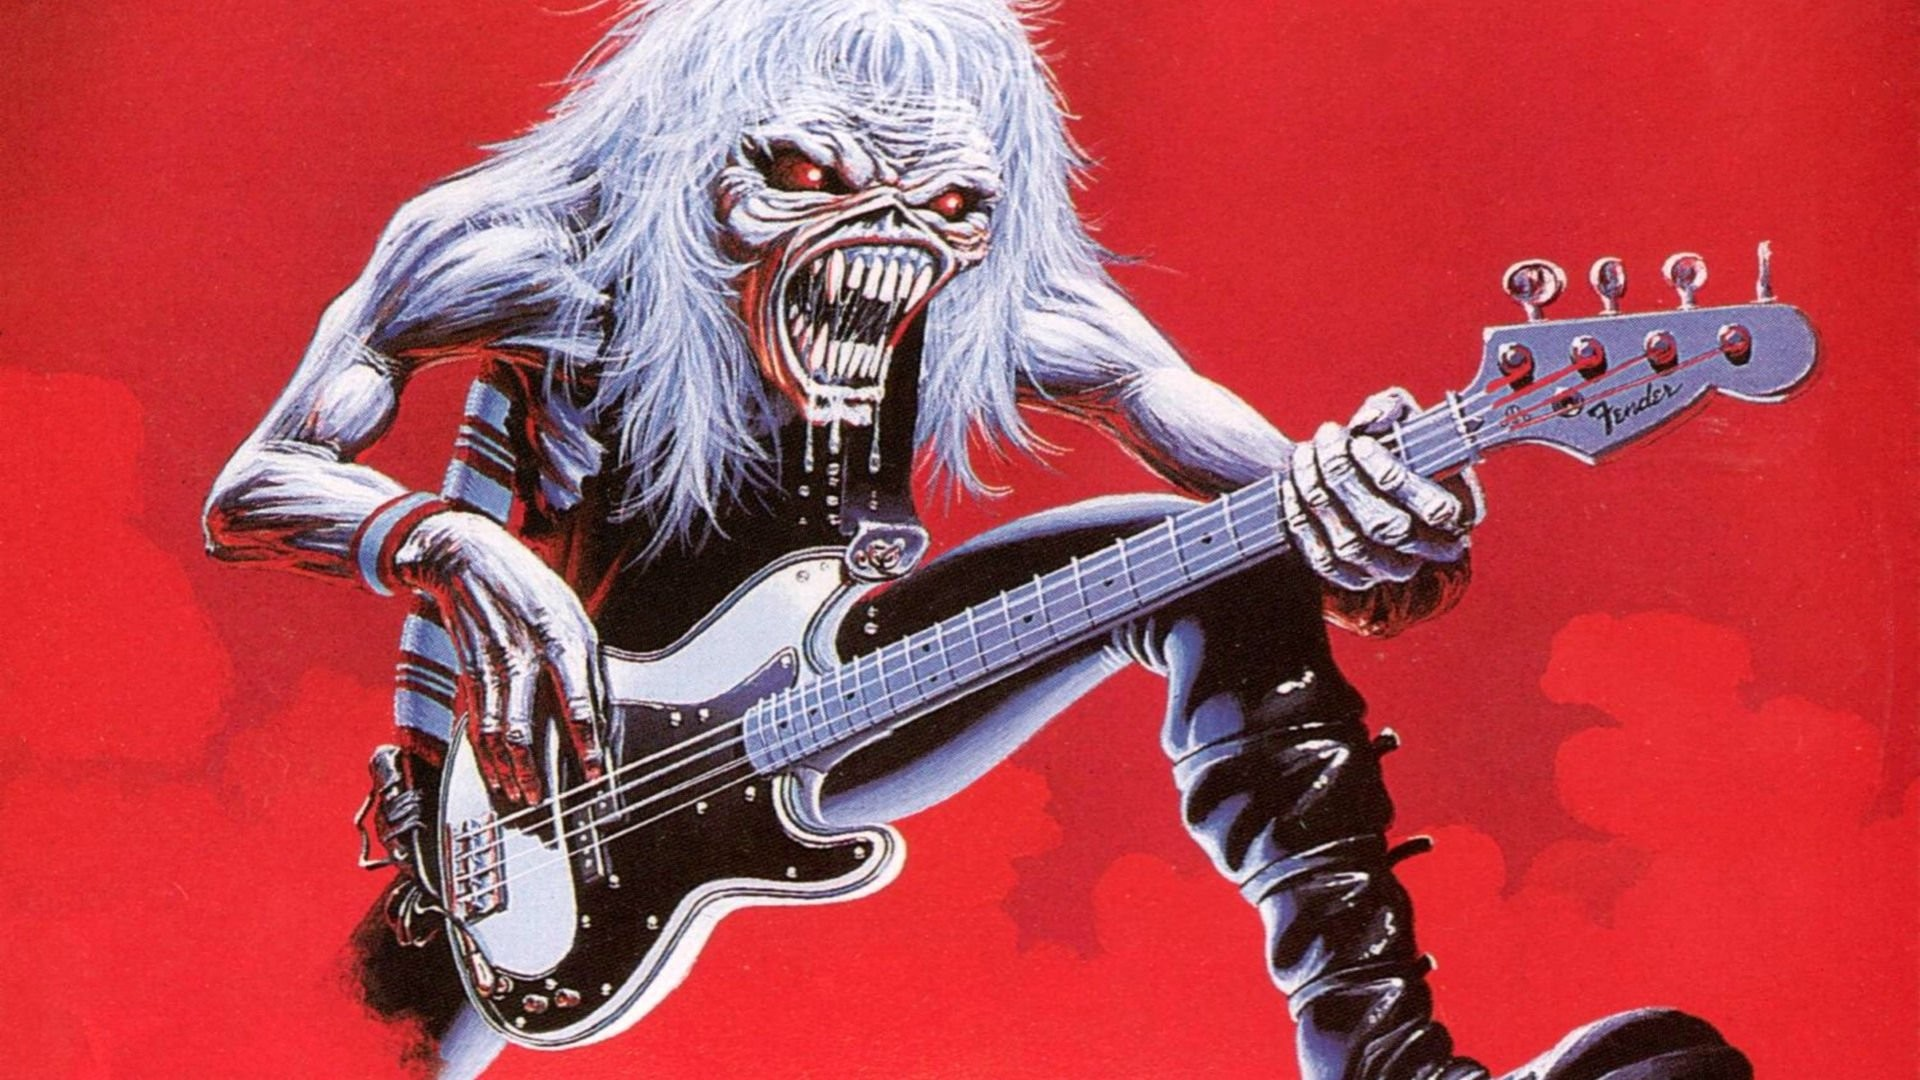 Iron Maiden Heavy Metal Power Artwork Fantasy Dark Evil Eddie Skull Demon  Poster Guitar Wallpaper At Dark Wallpapers